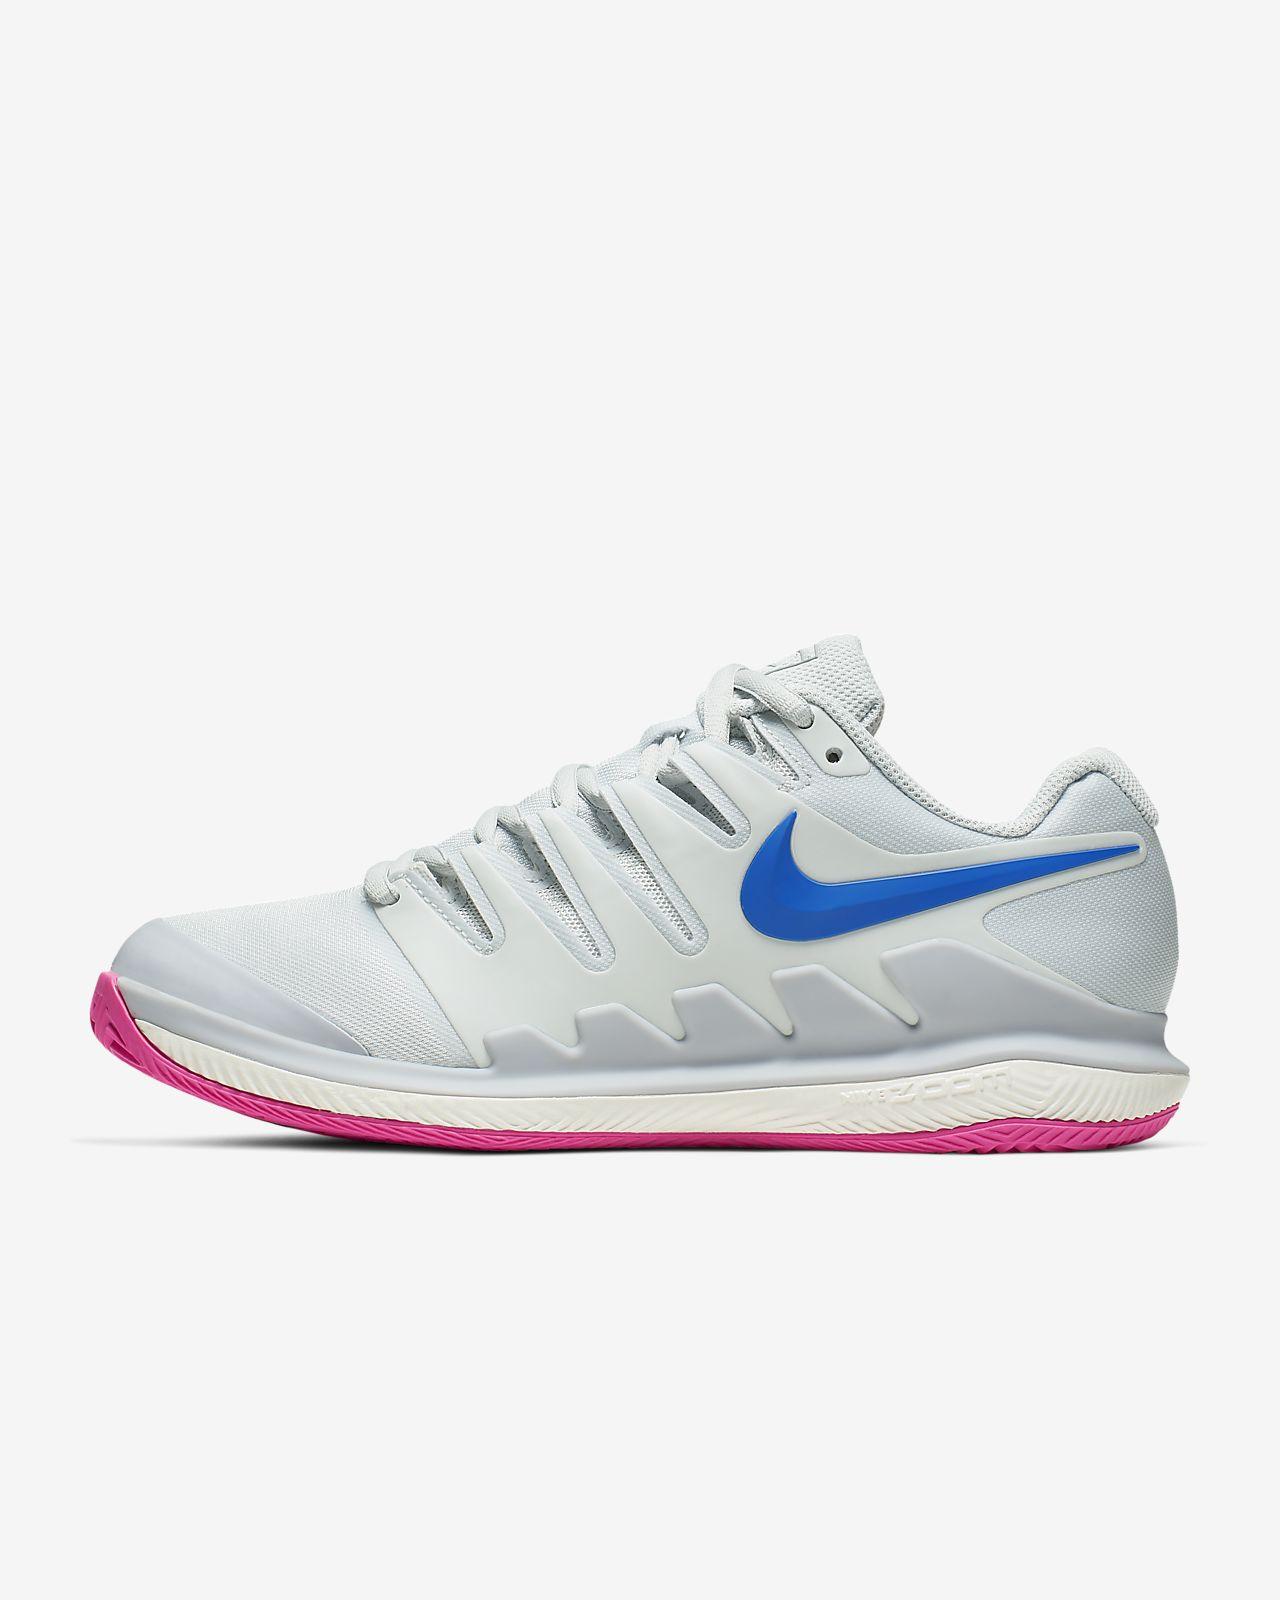 NikeCourt Air Zoom Vapor X Damen-Tennisschuh für Sandplätze